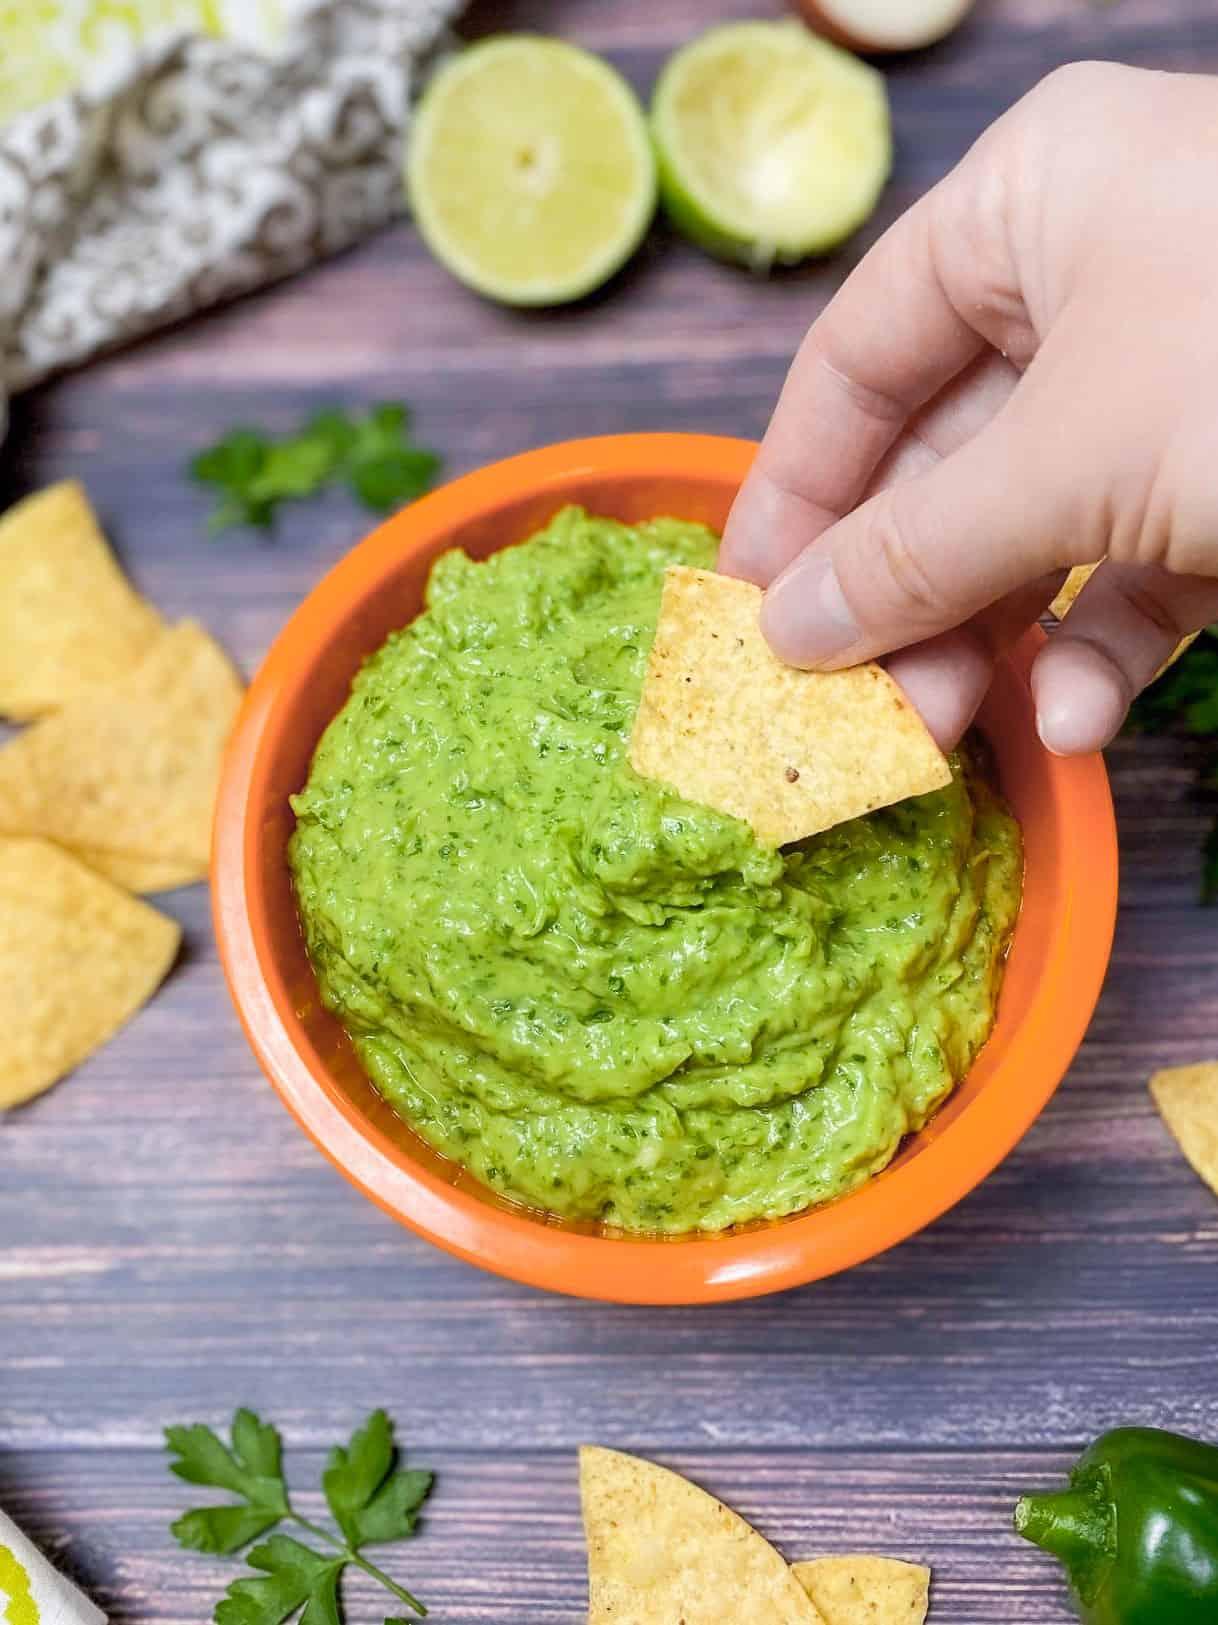 dipping tortilla chip into green dip